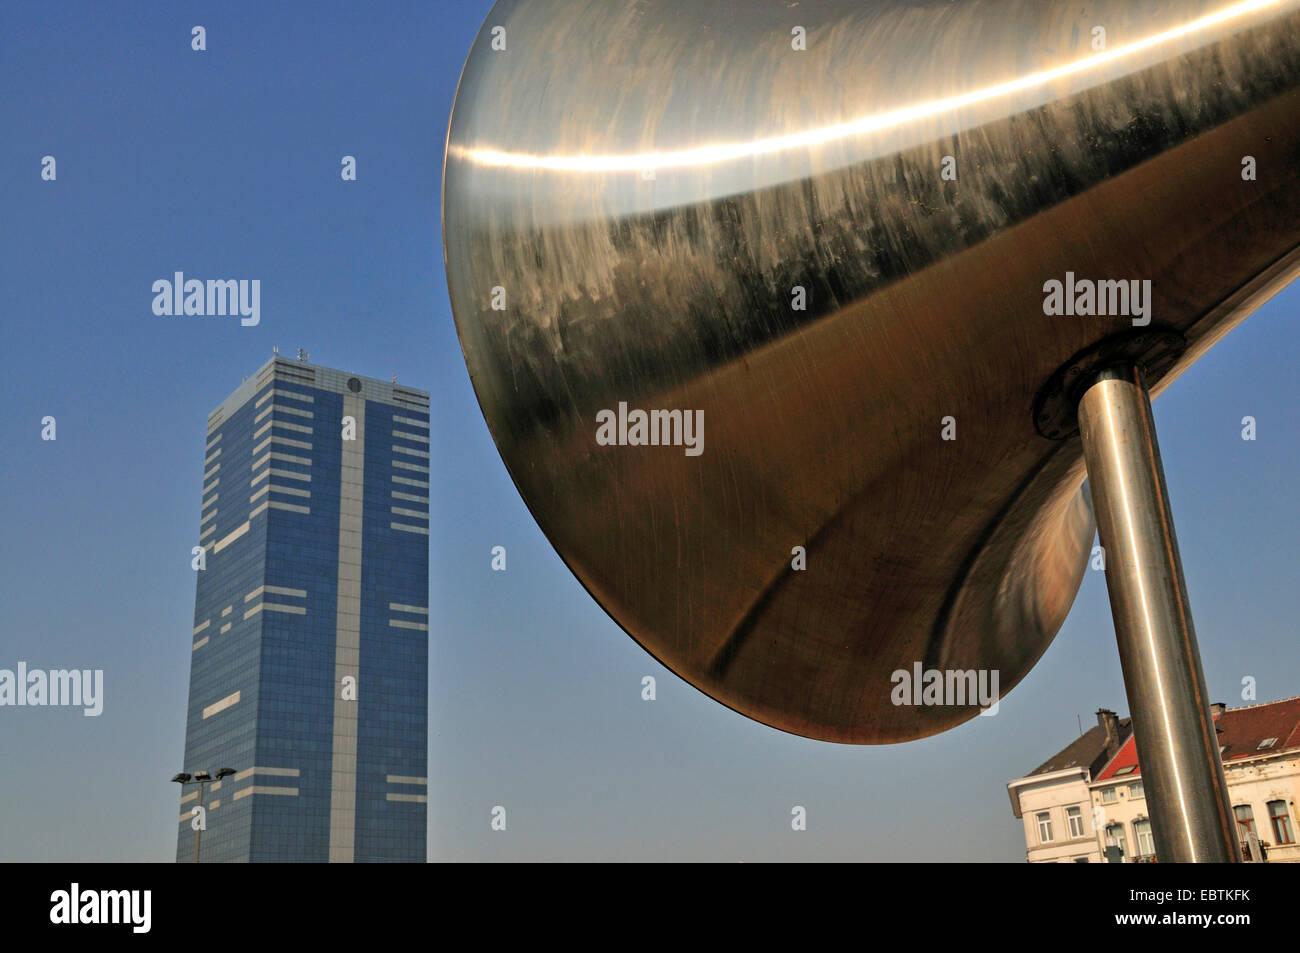 loud-hailer La Pasionaria, South Tower in background, Belgium, Brussels - Stock Image